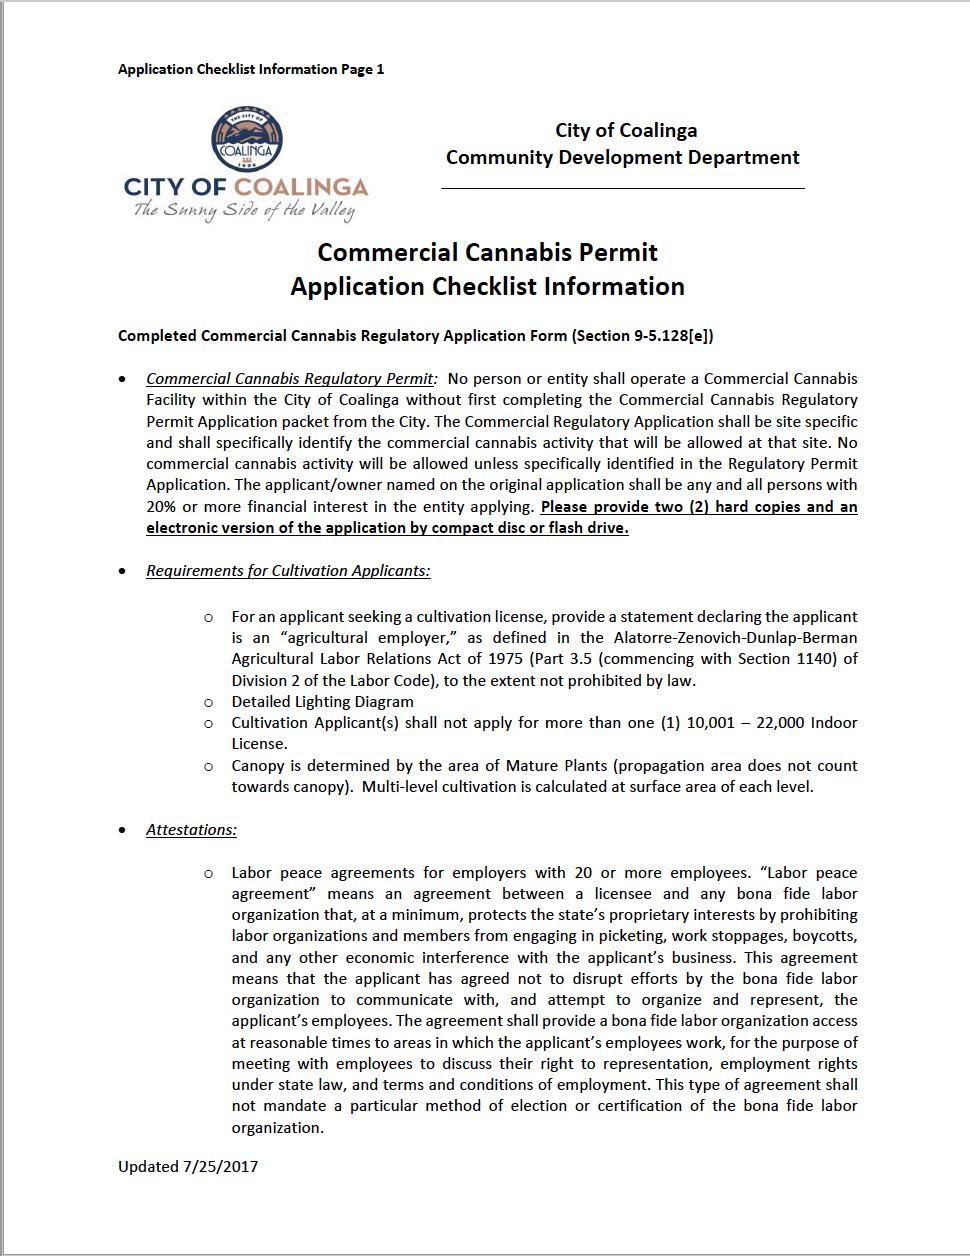 Permit Application Checklist.png